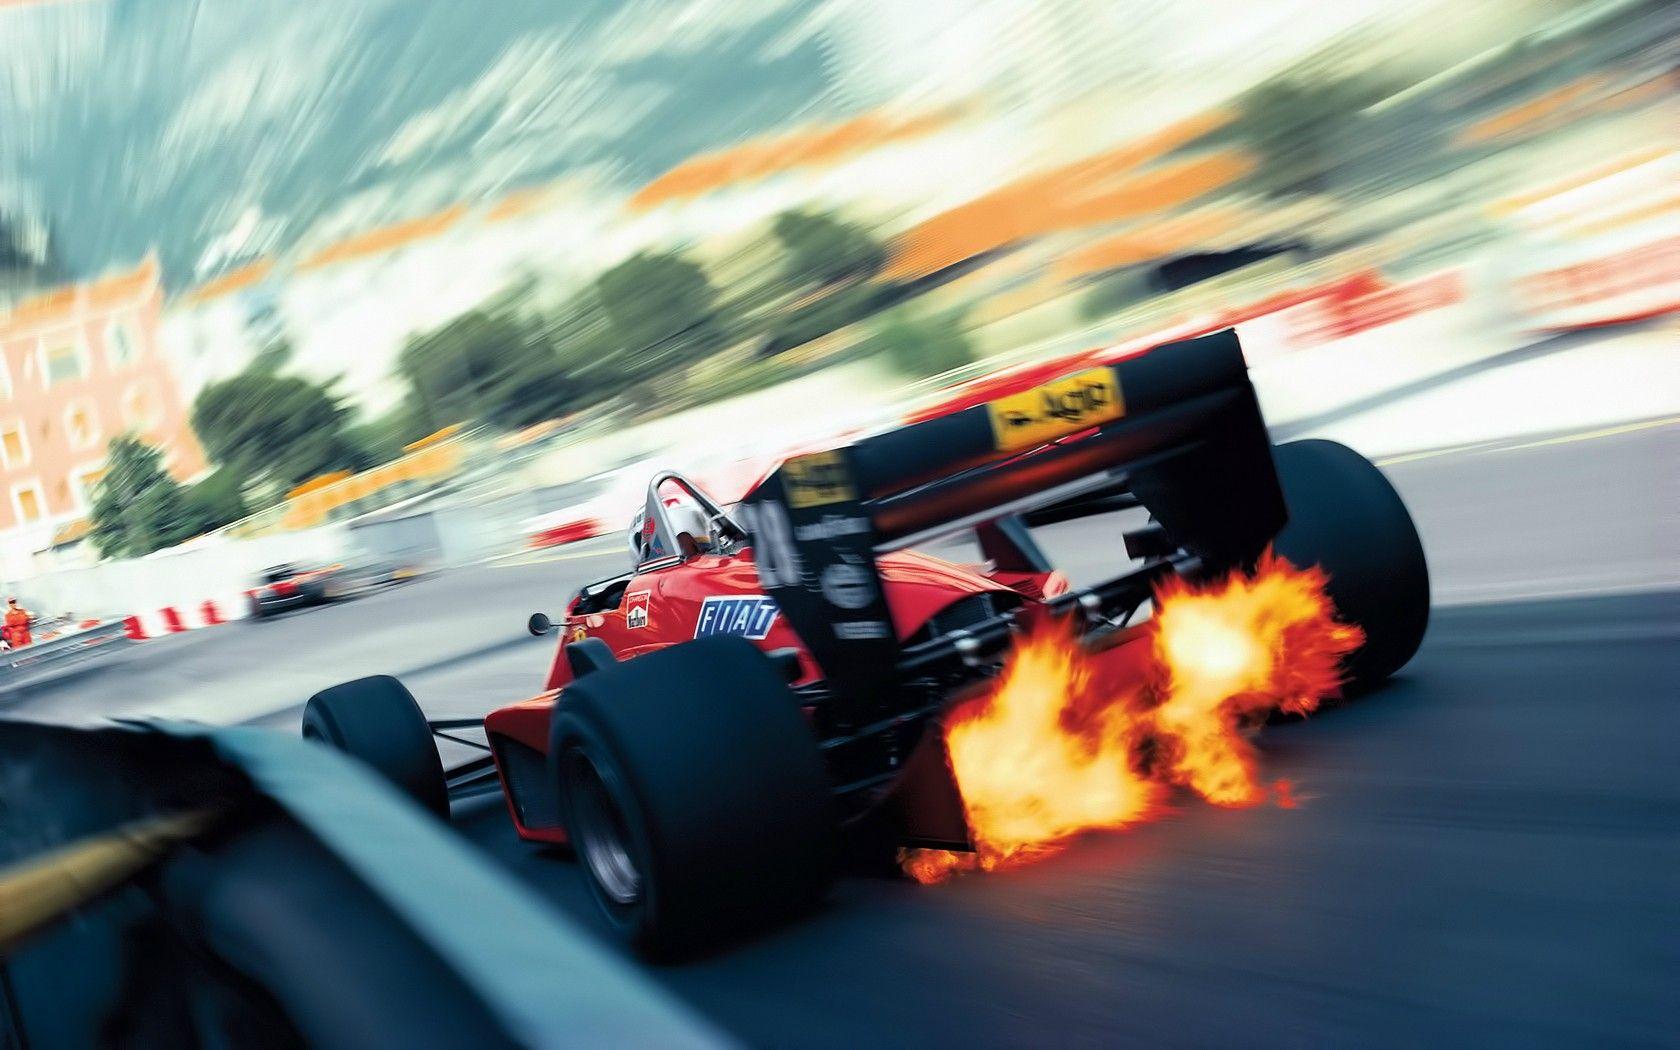 Ferrari Racing Formula 1 Vintage Blurred Wallpapers Hd Desktop And Mobile Backgrounds Formula 1 Car Racing Formula 1